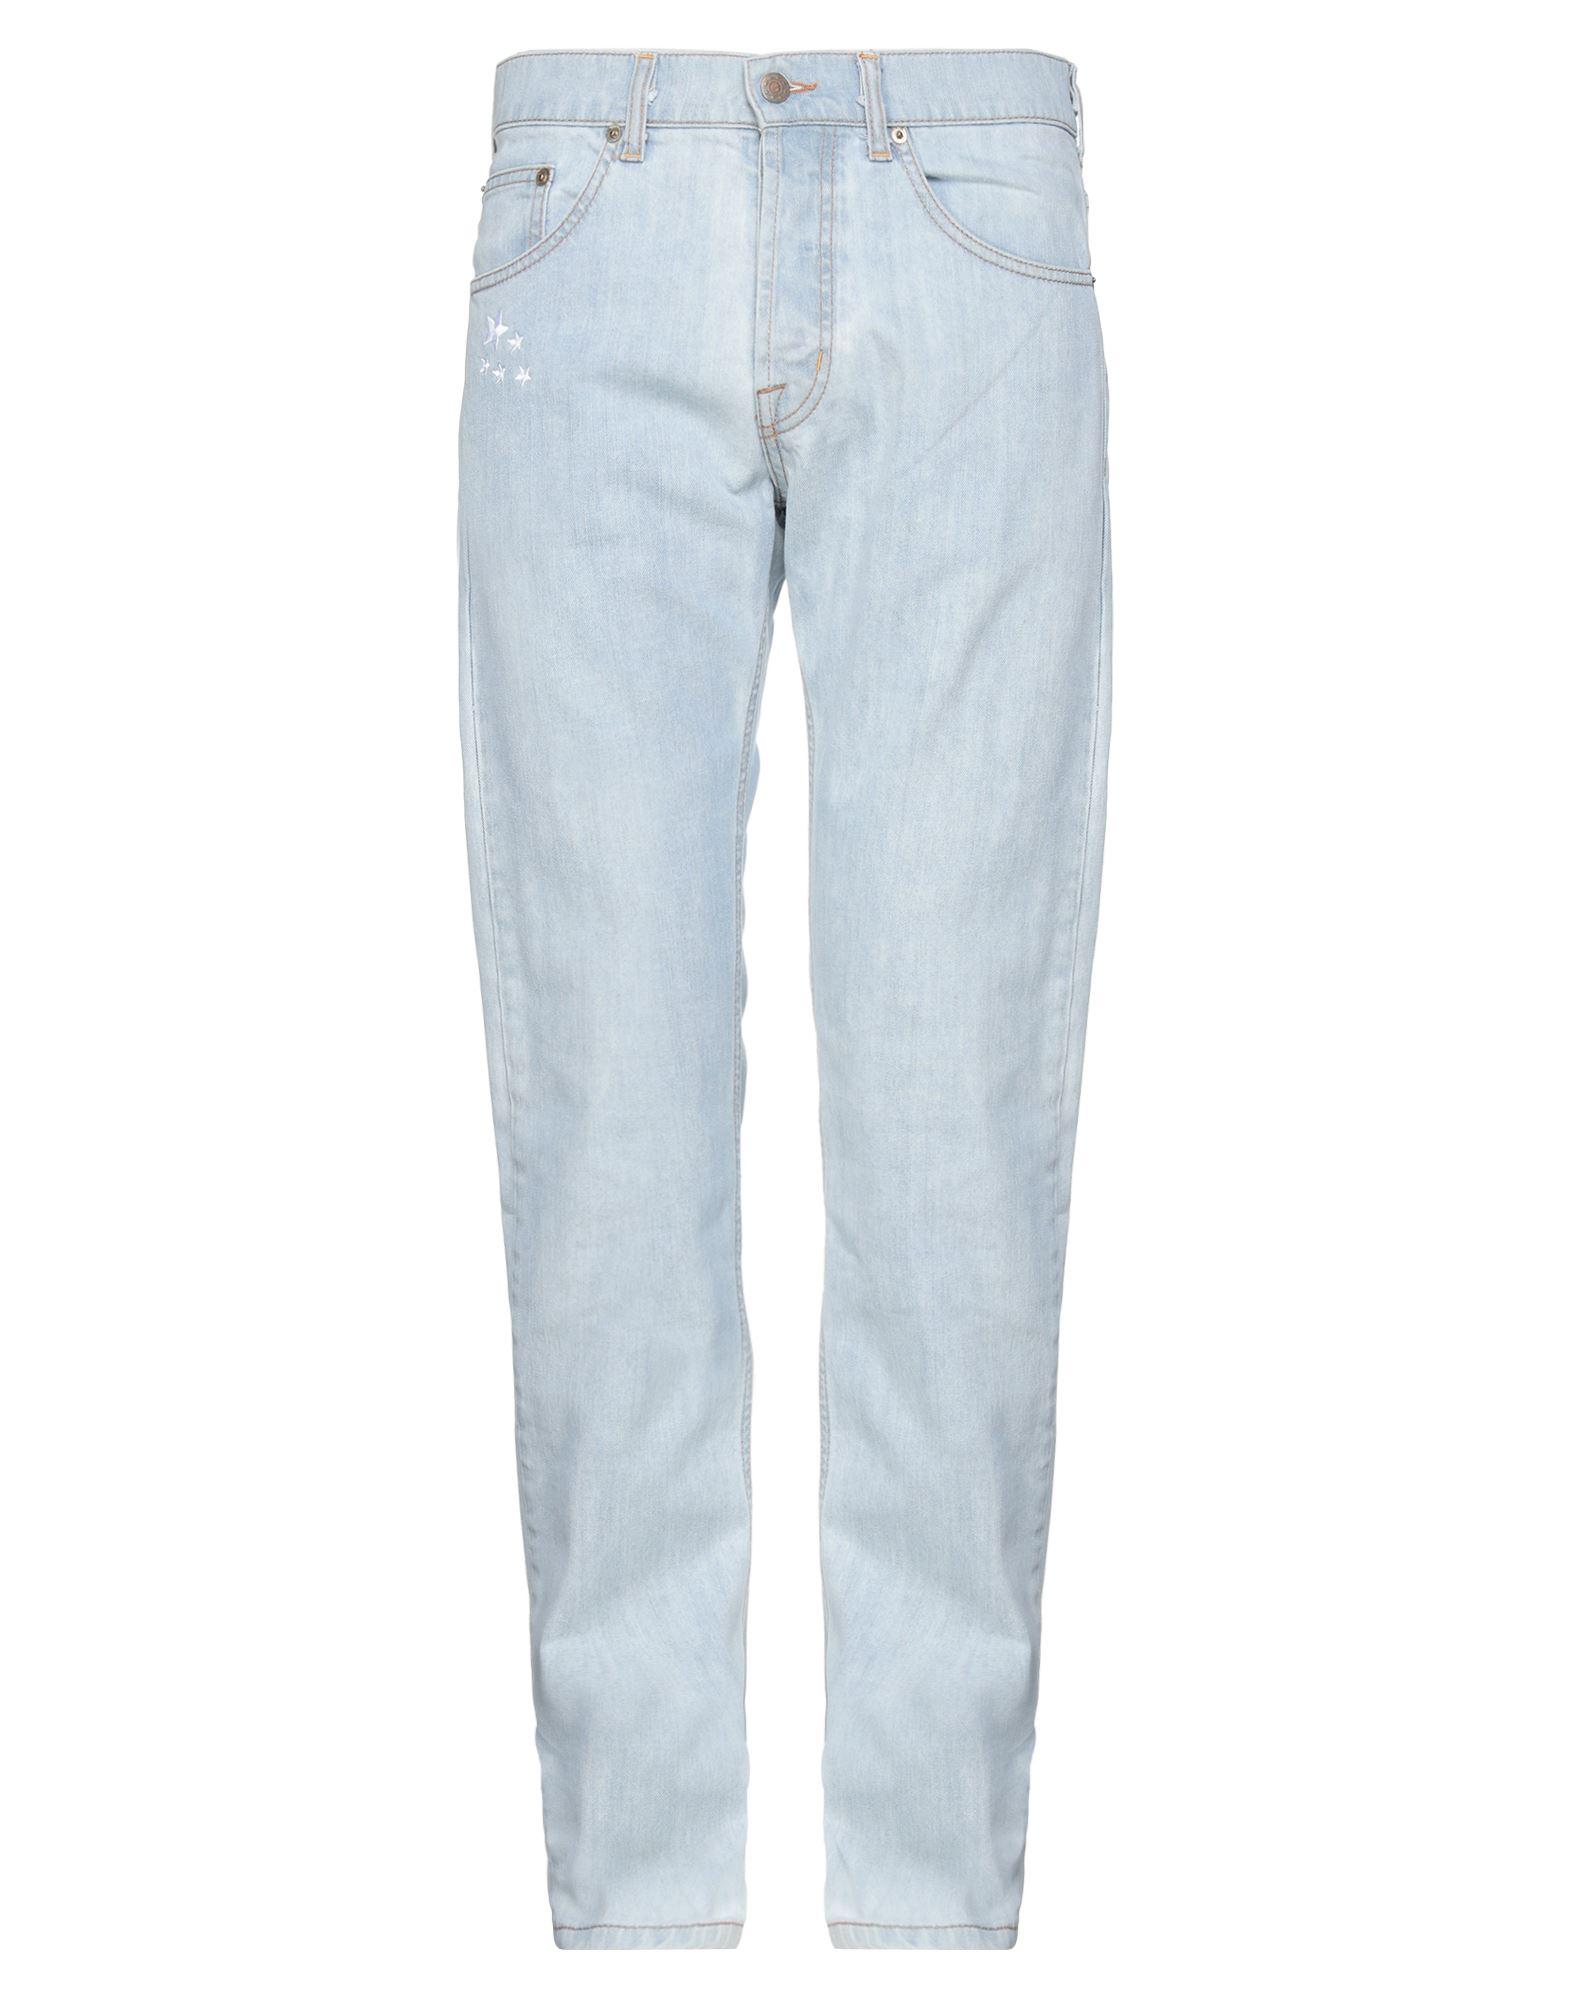 the great джинсовые брюки THE EDITOR Джинсовые брюки